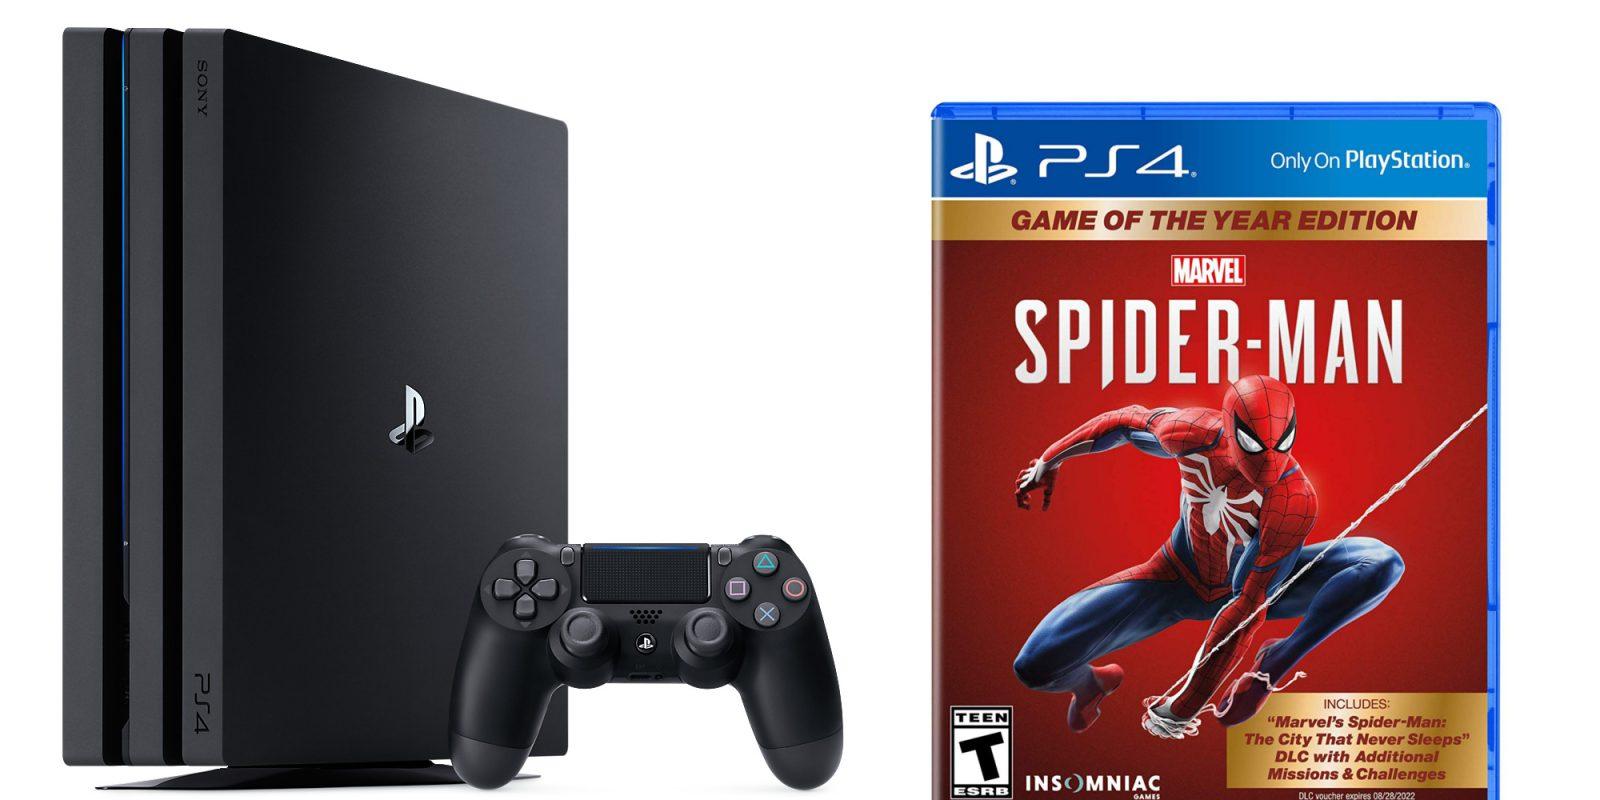 PlayStation 4 Pro 1TB + Spider-Man GOTY gets huge price drop: $280 ($150+ off)